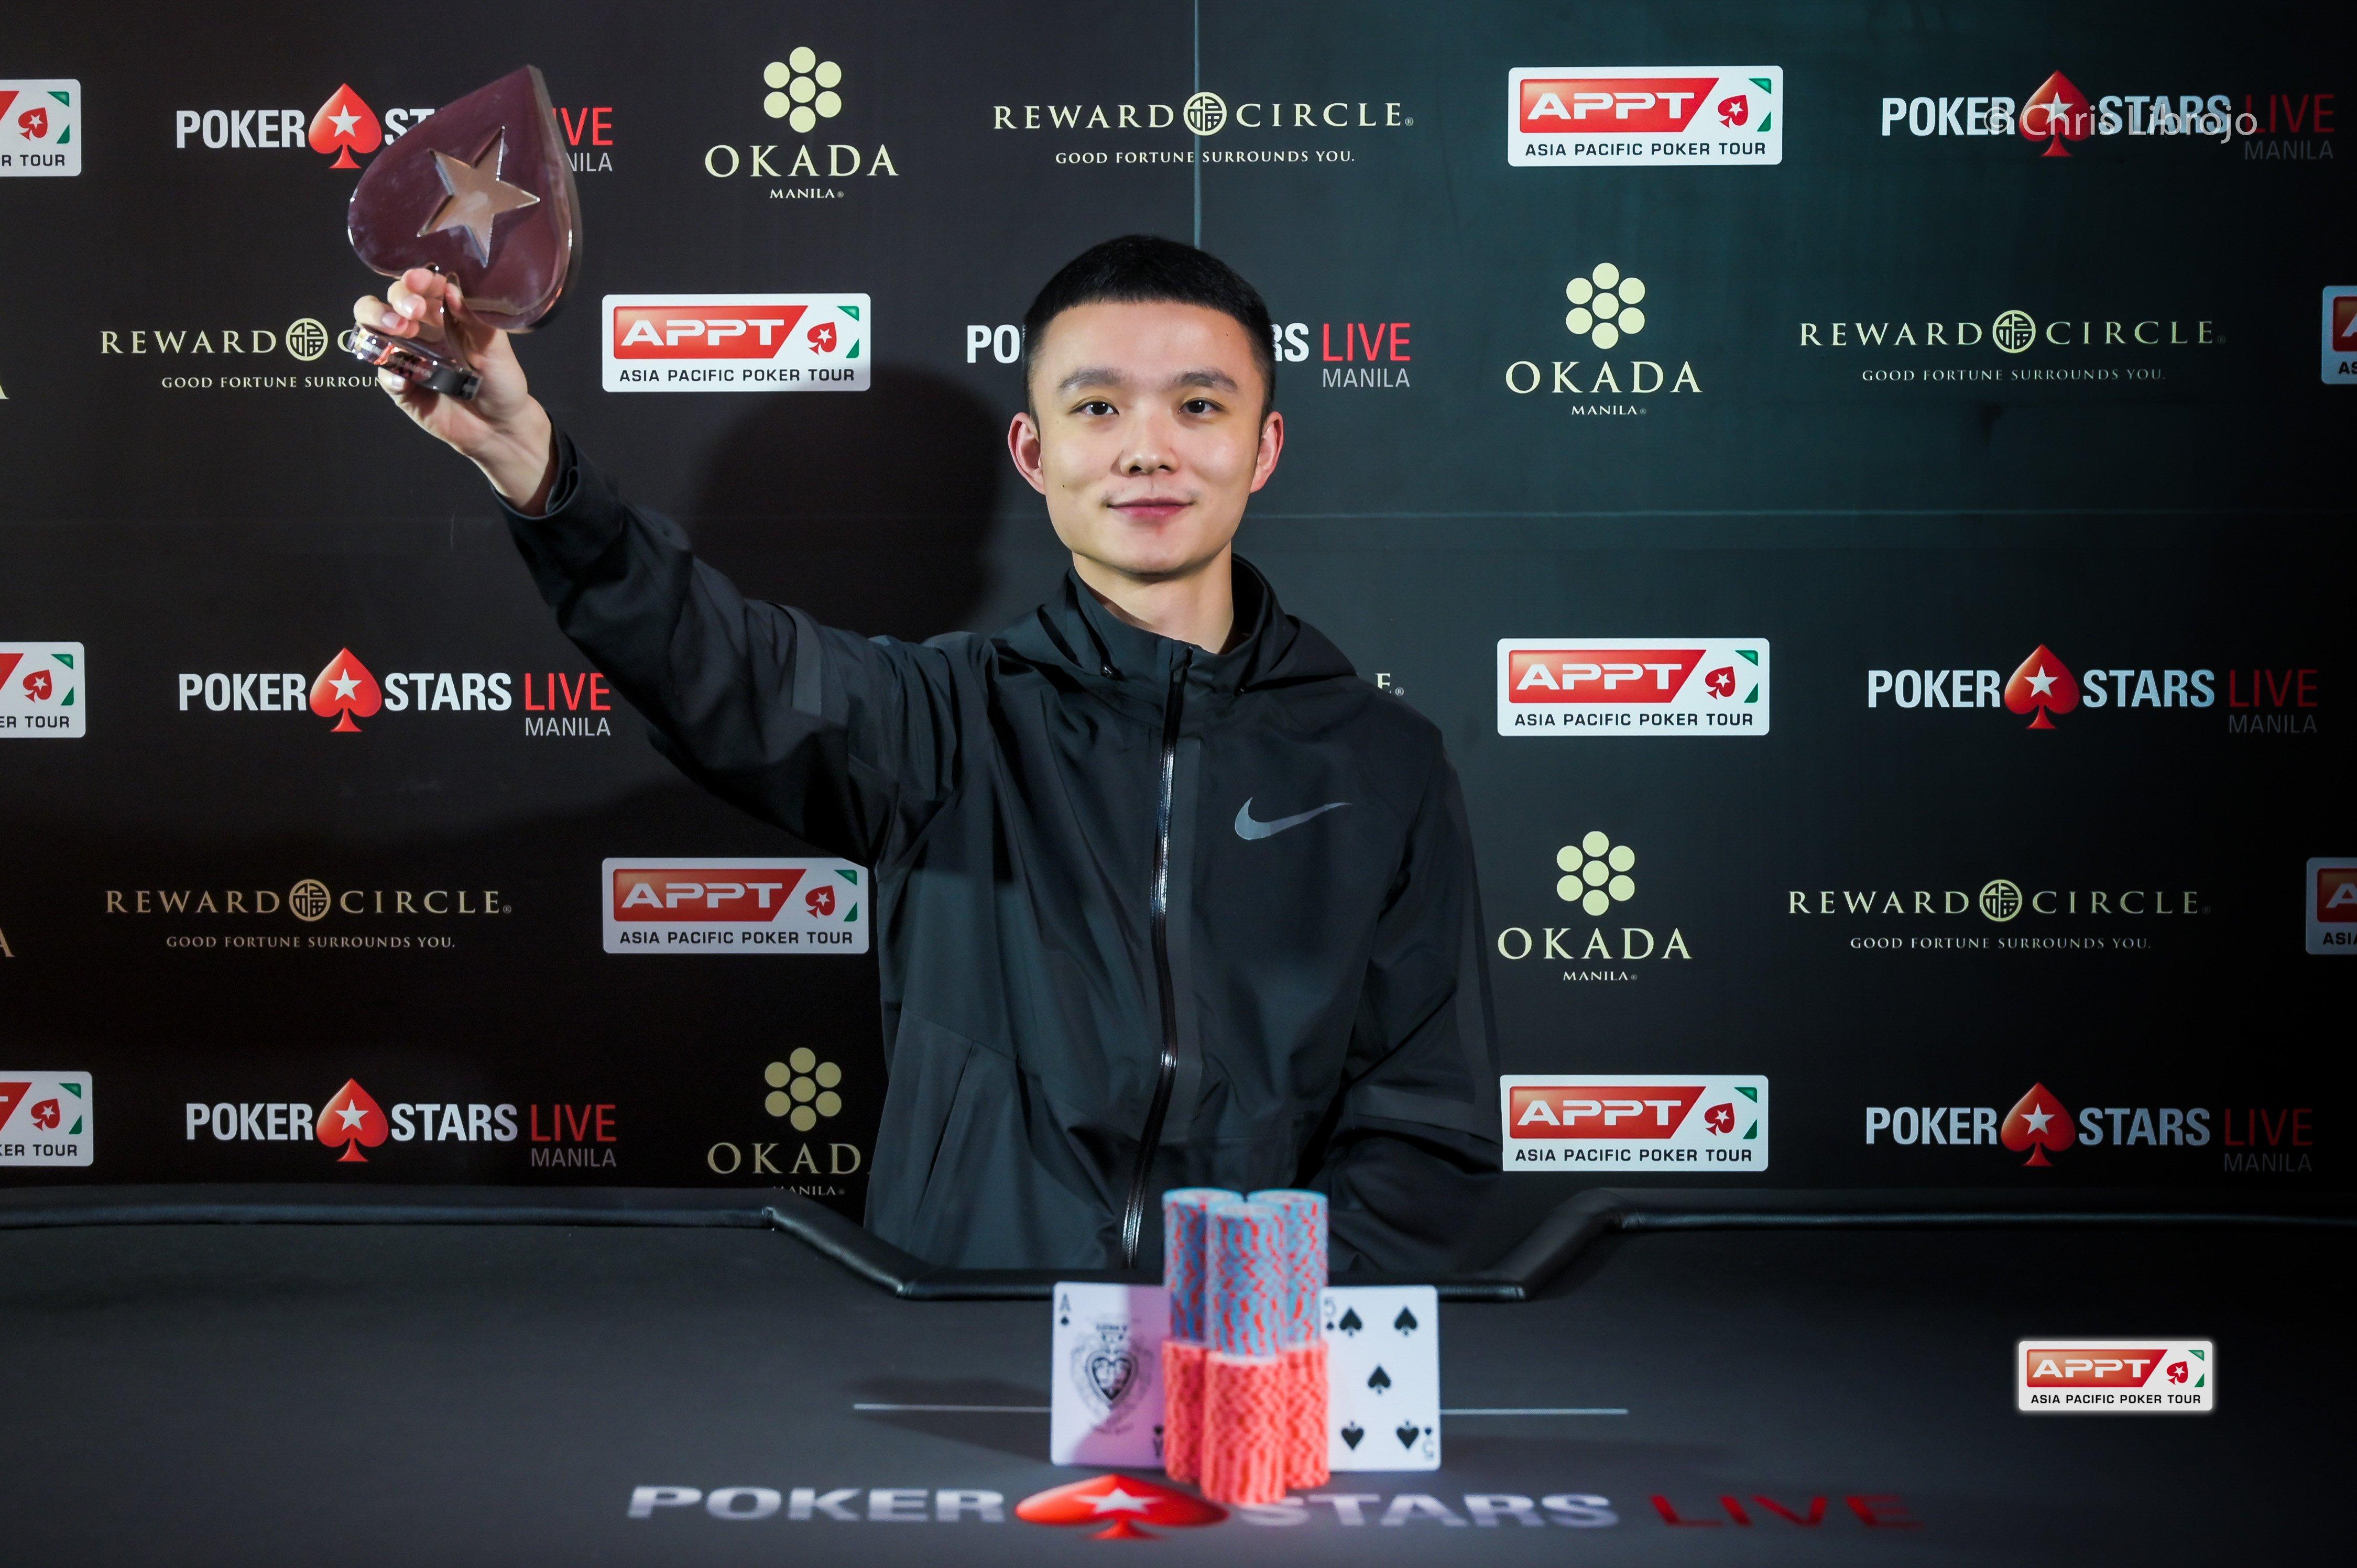 Event 8 Winner Wayne Weiyi Zhang